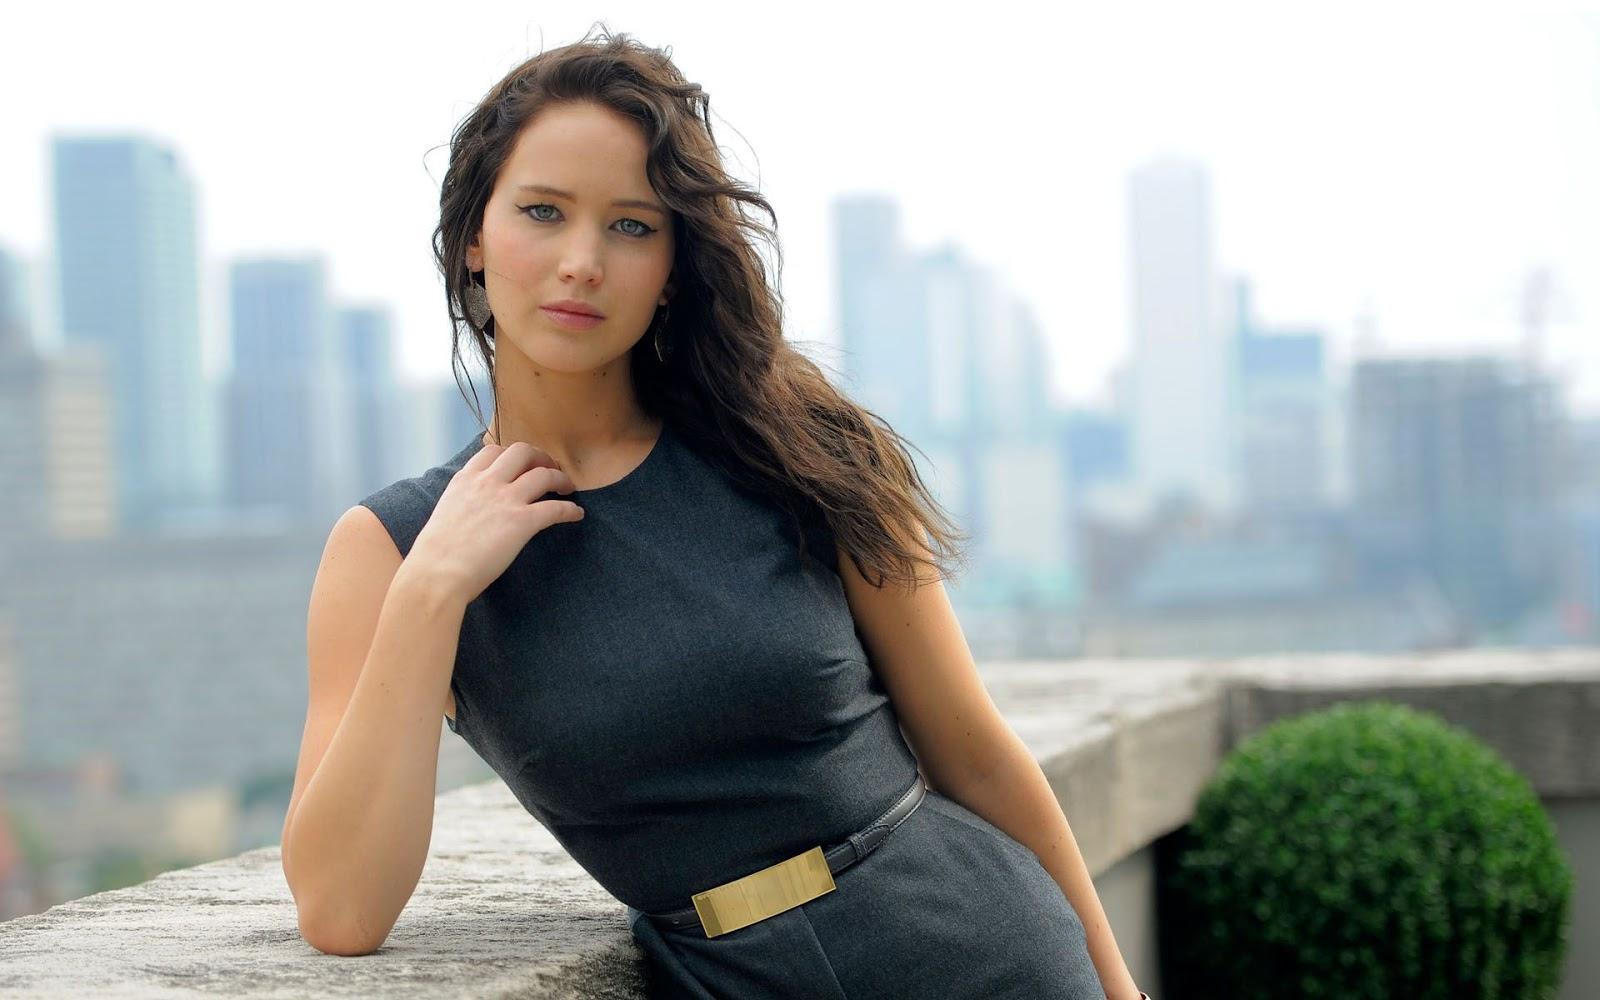 Jennifer Lawrence Hd Wallpapers HD Wallpapers 1600x1000